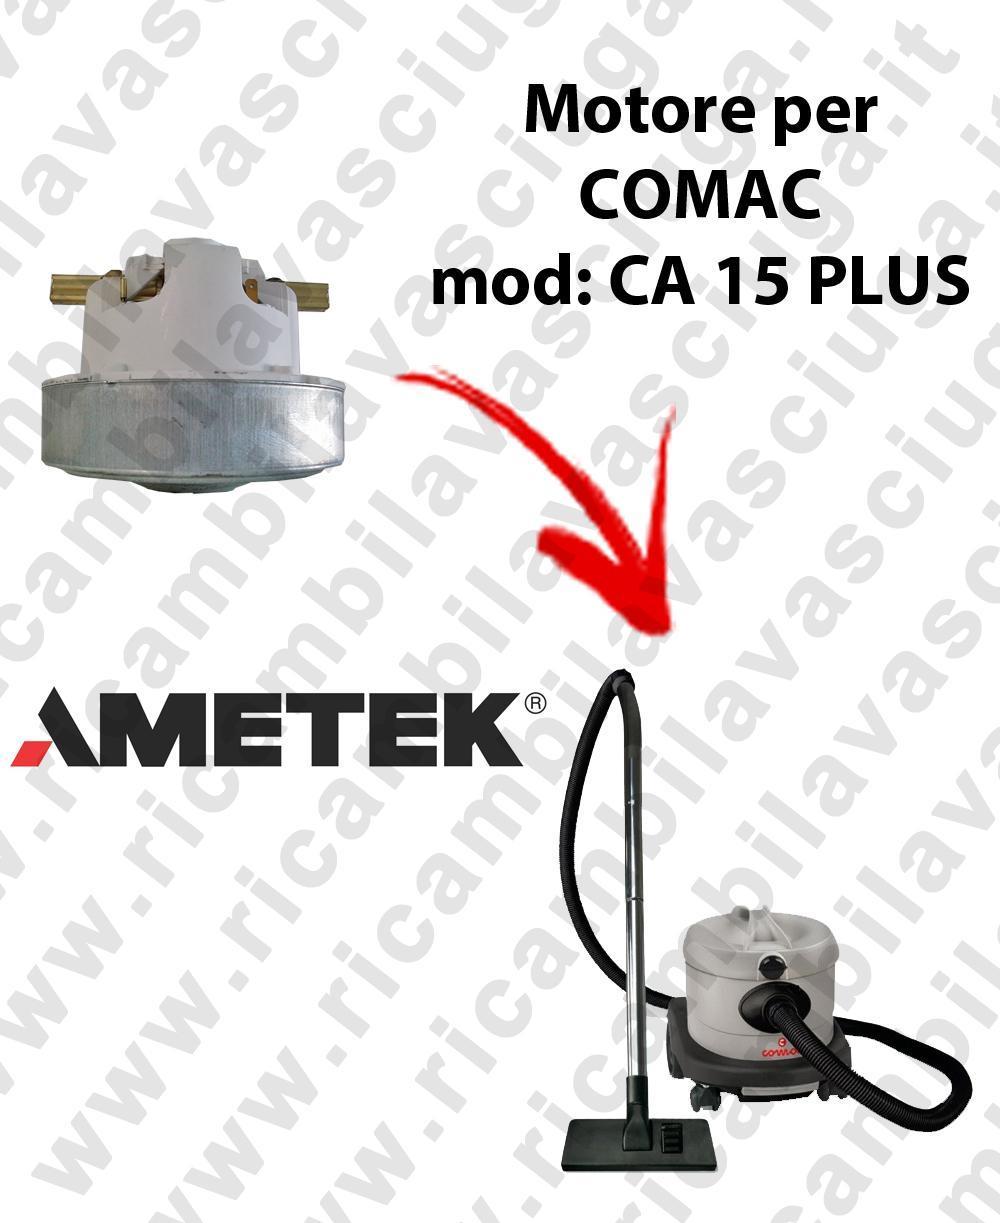 CA 15 PLUS AMETEK Vacuum motor for vacuum cleaner COMAC